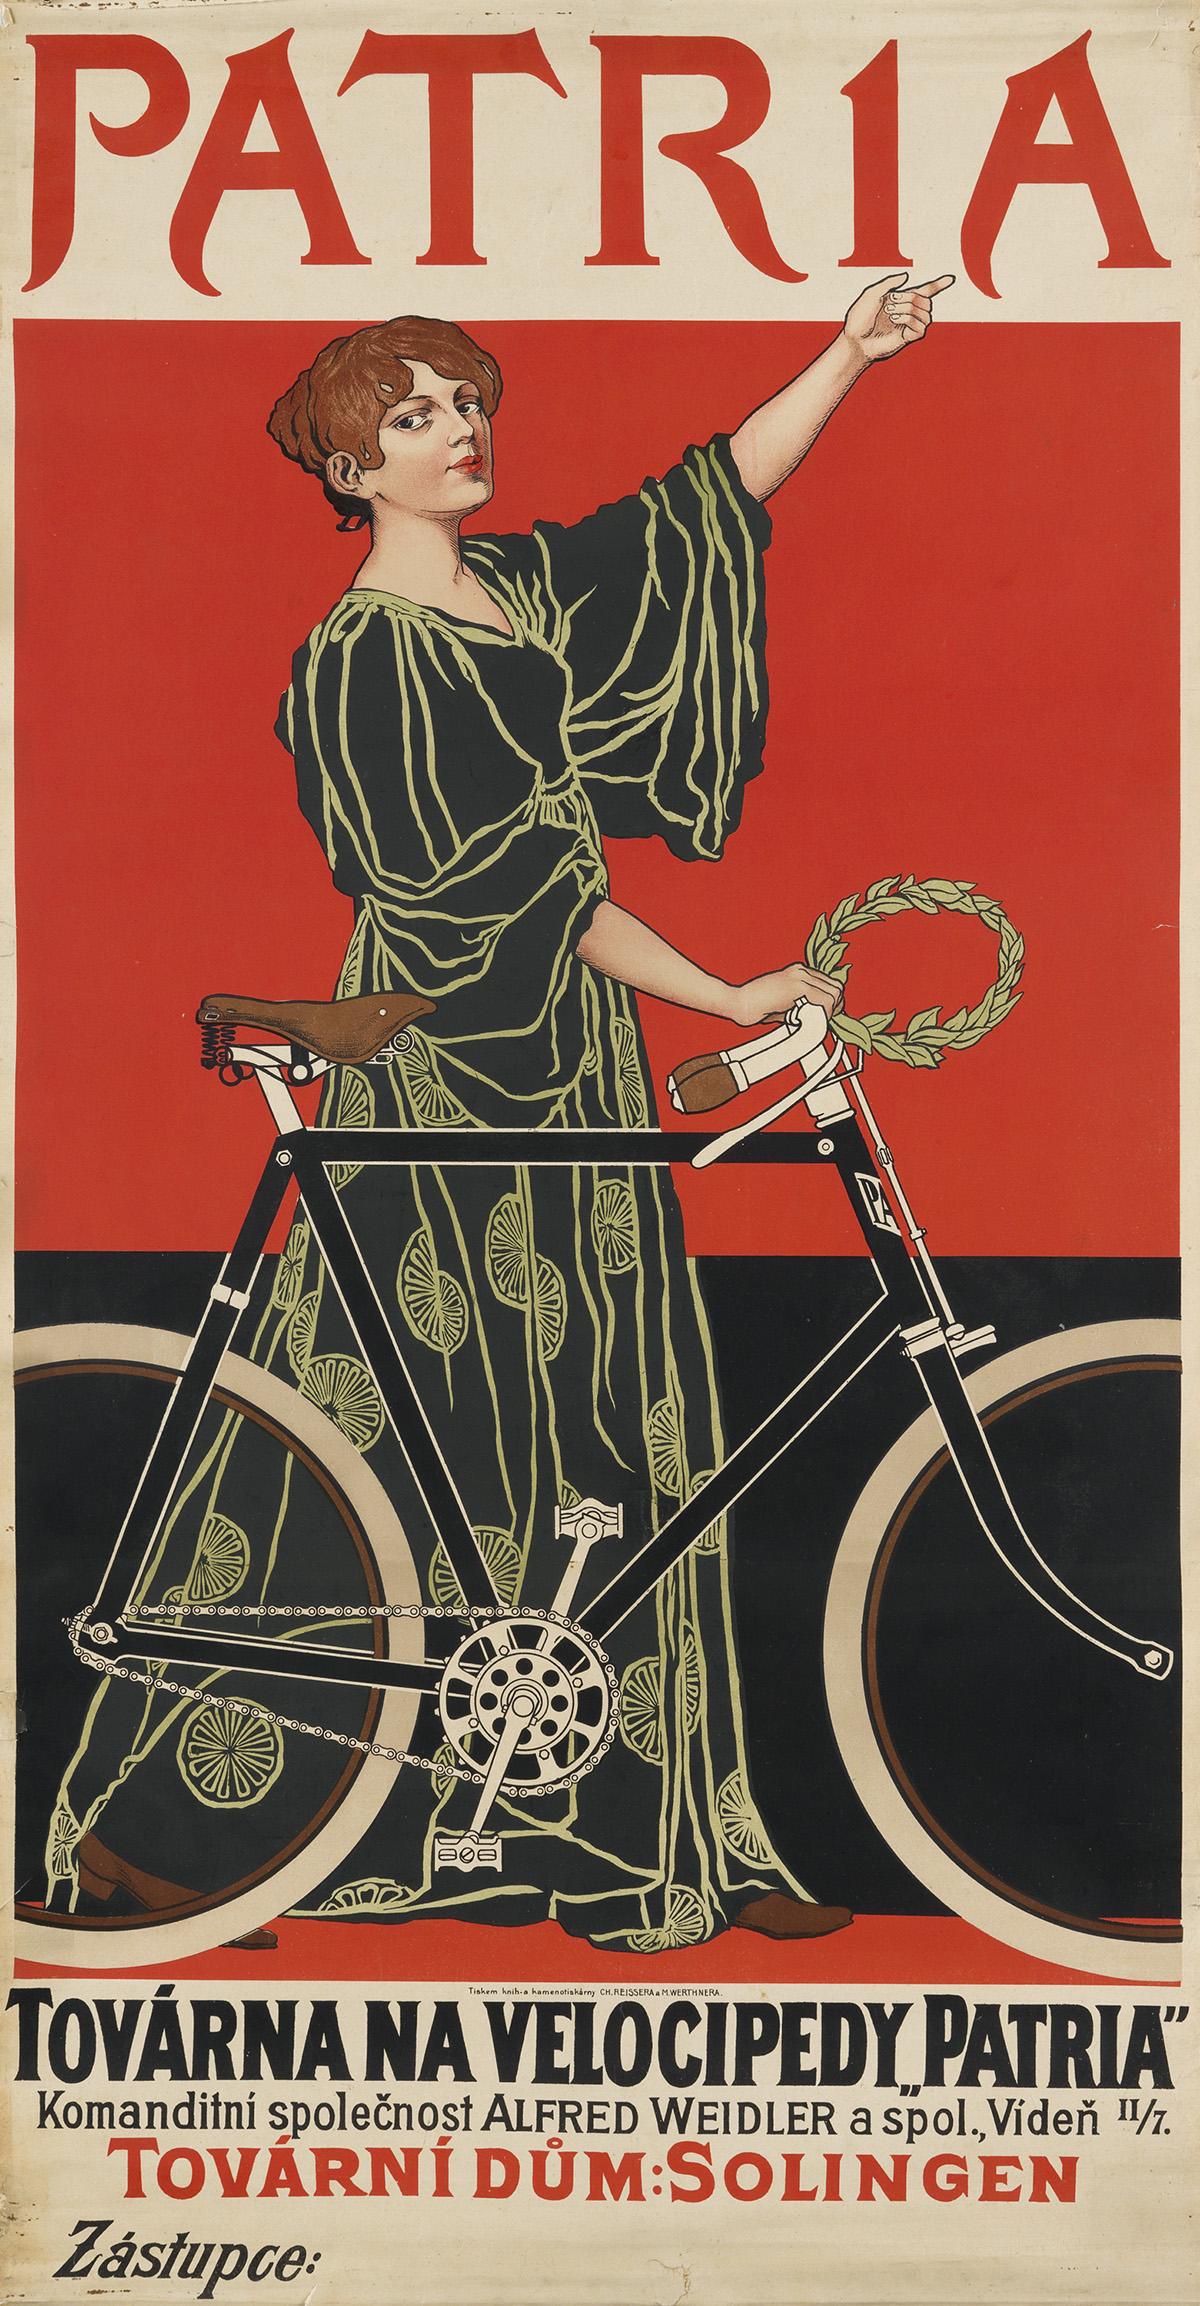 ROBERT-ENGELS-(1866-1926)-PATRIA-1902-36x18-inches-92x46-cm-